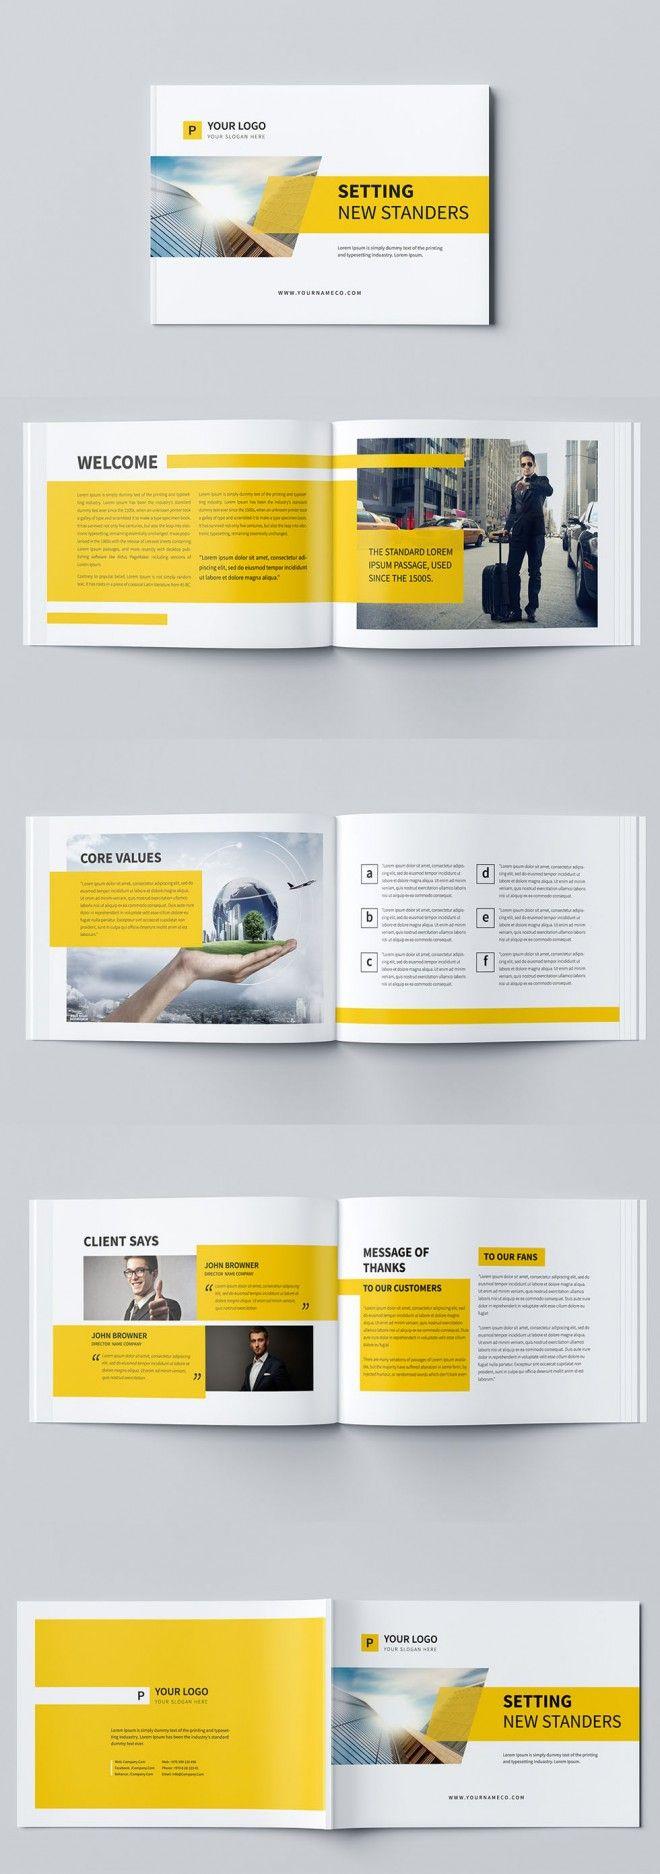 Best-brochure-templates-8 October Newsletter Template Pinterest on printable downloadable, free downloadable preschool,